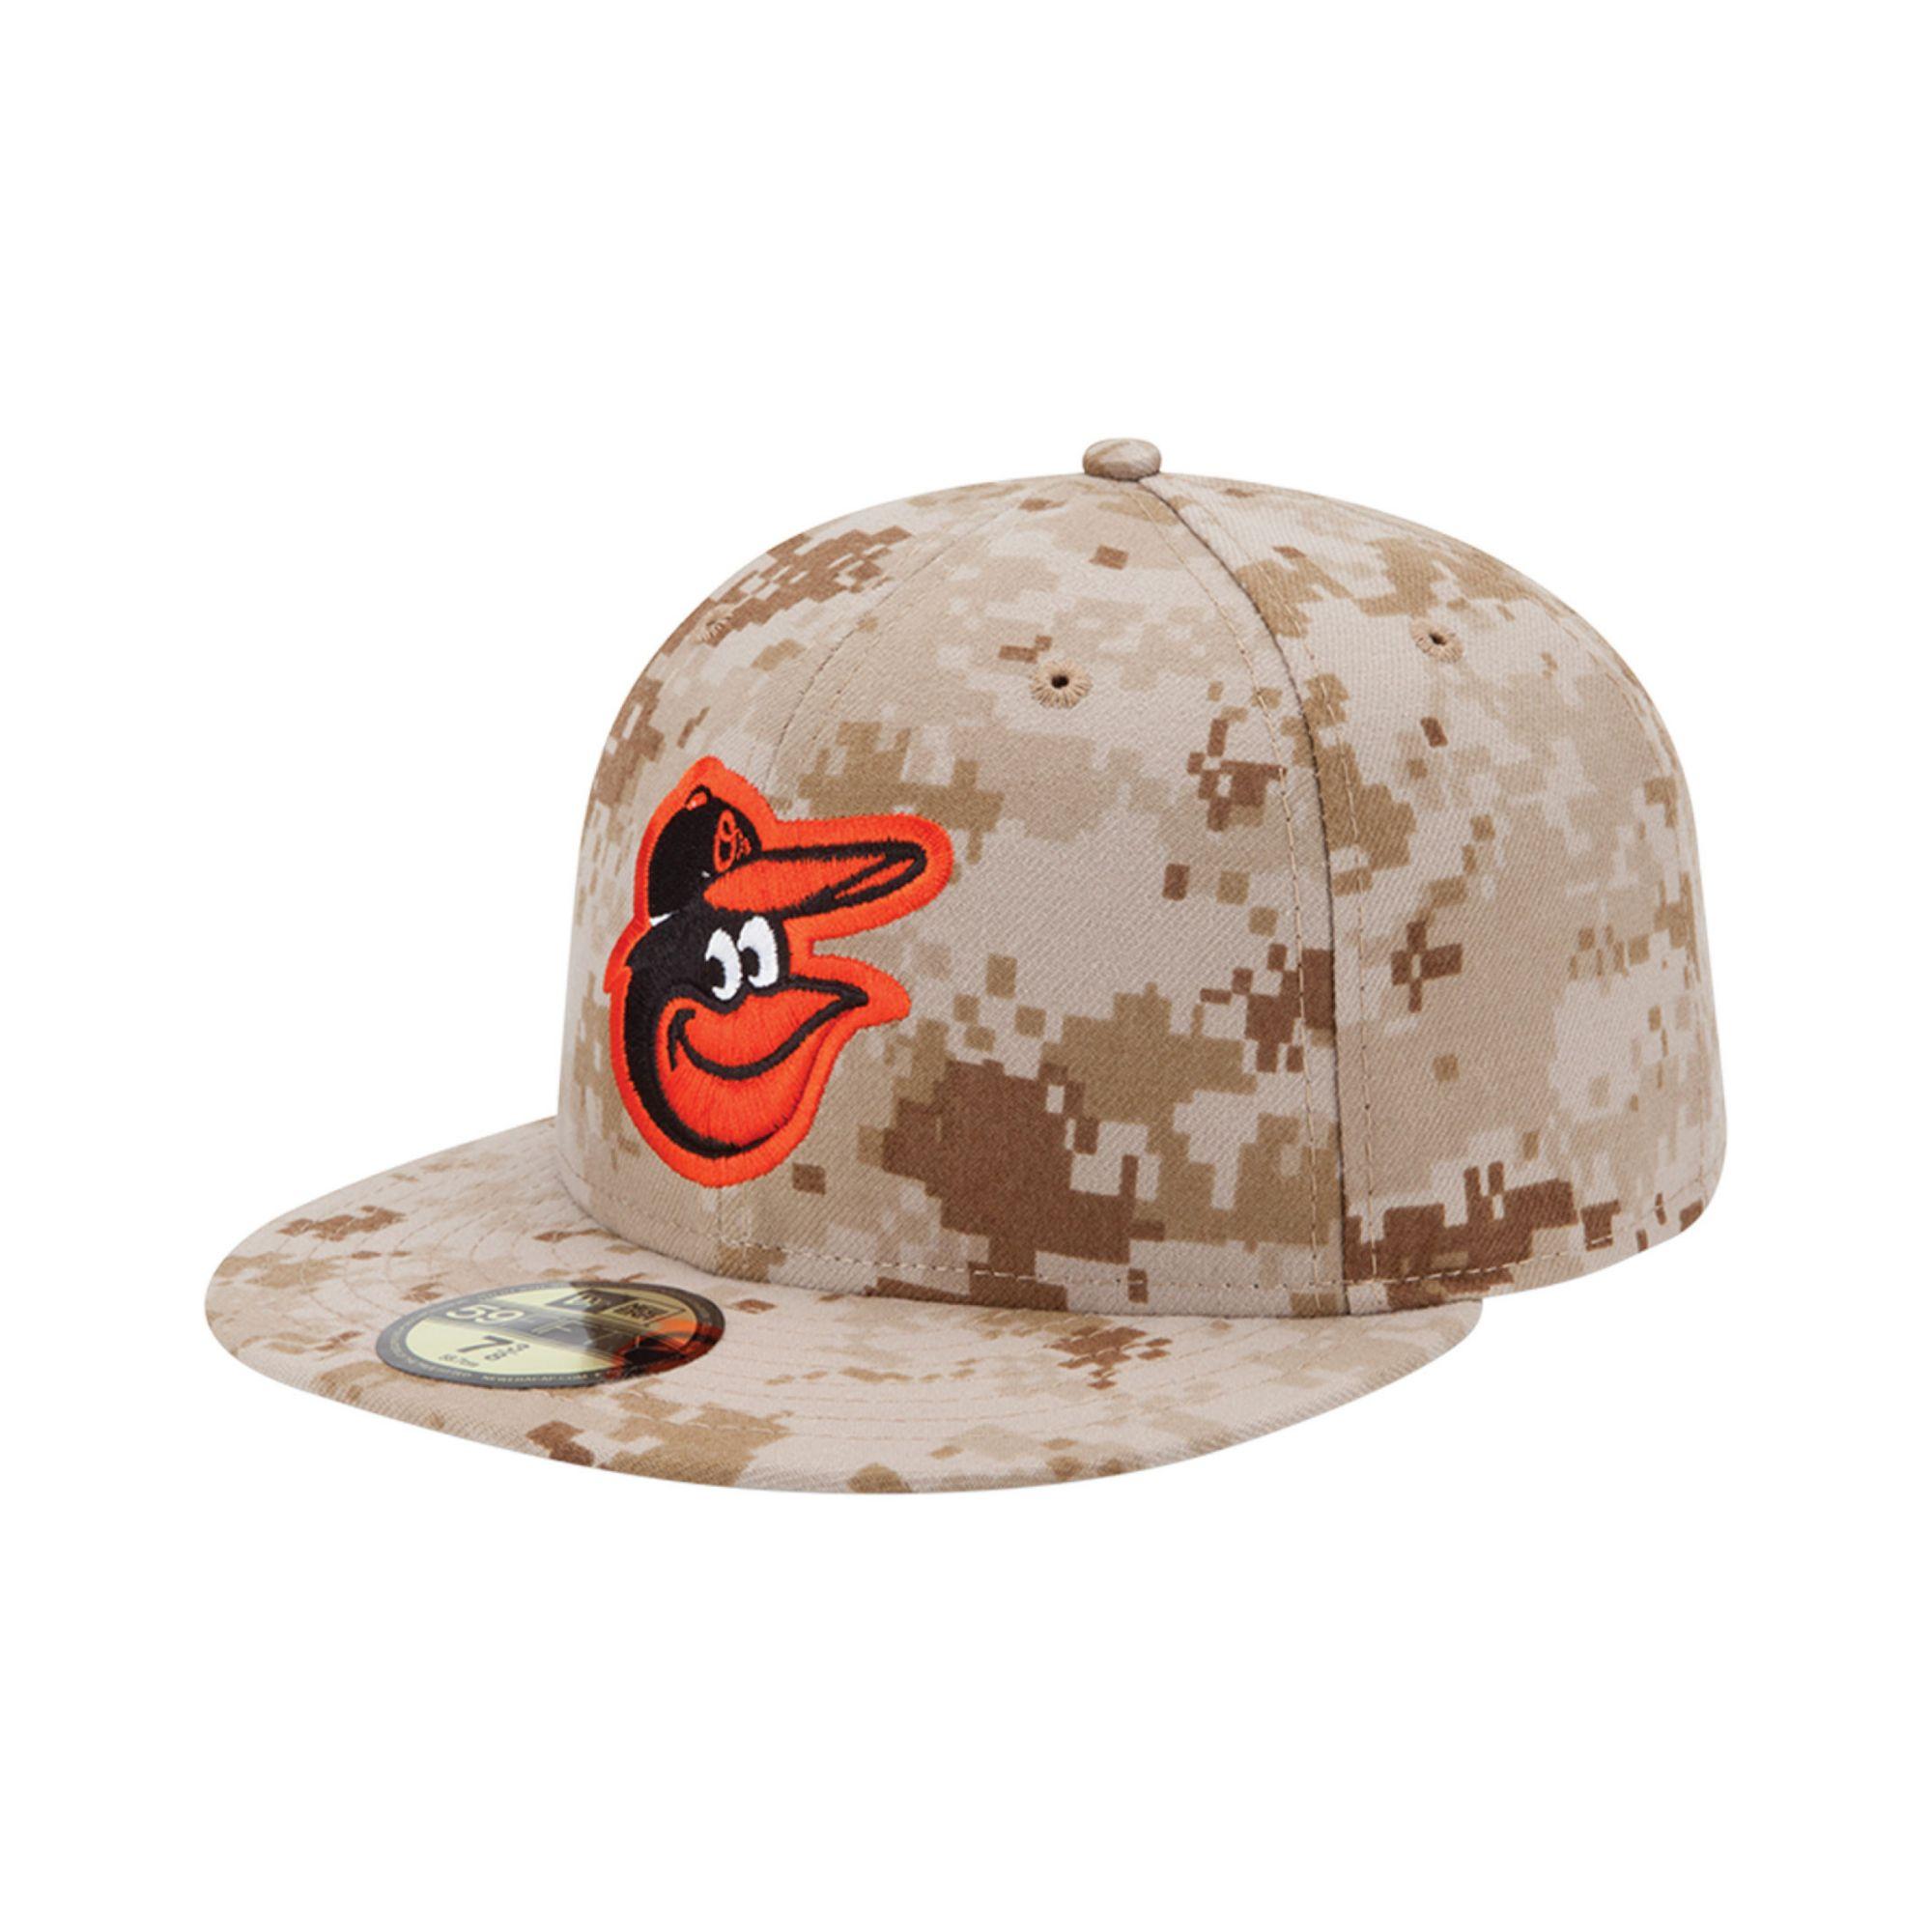 9a4ad0e3910 Lyst - Ktz Baltimore Orioles Mlb Memorial Day Stars Stripes 59fifty ...